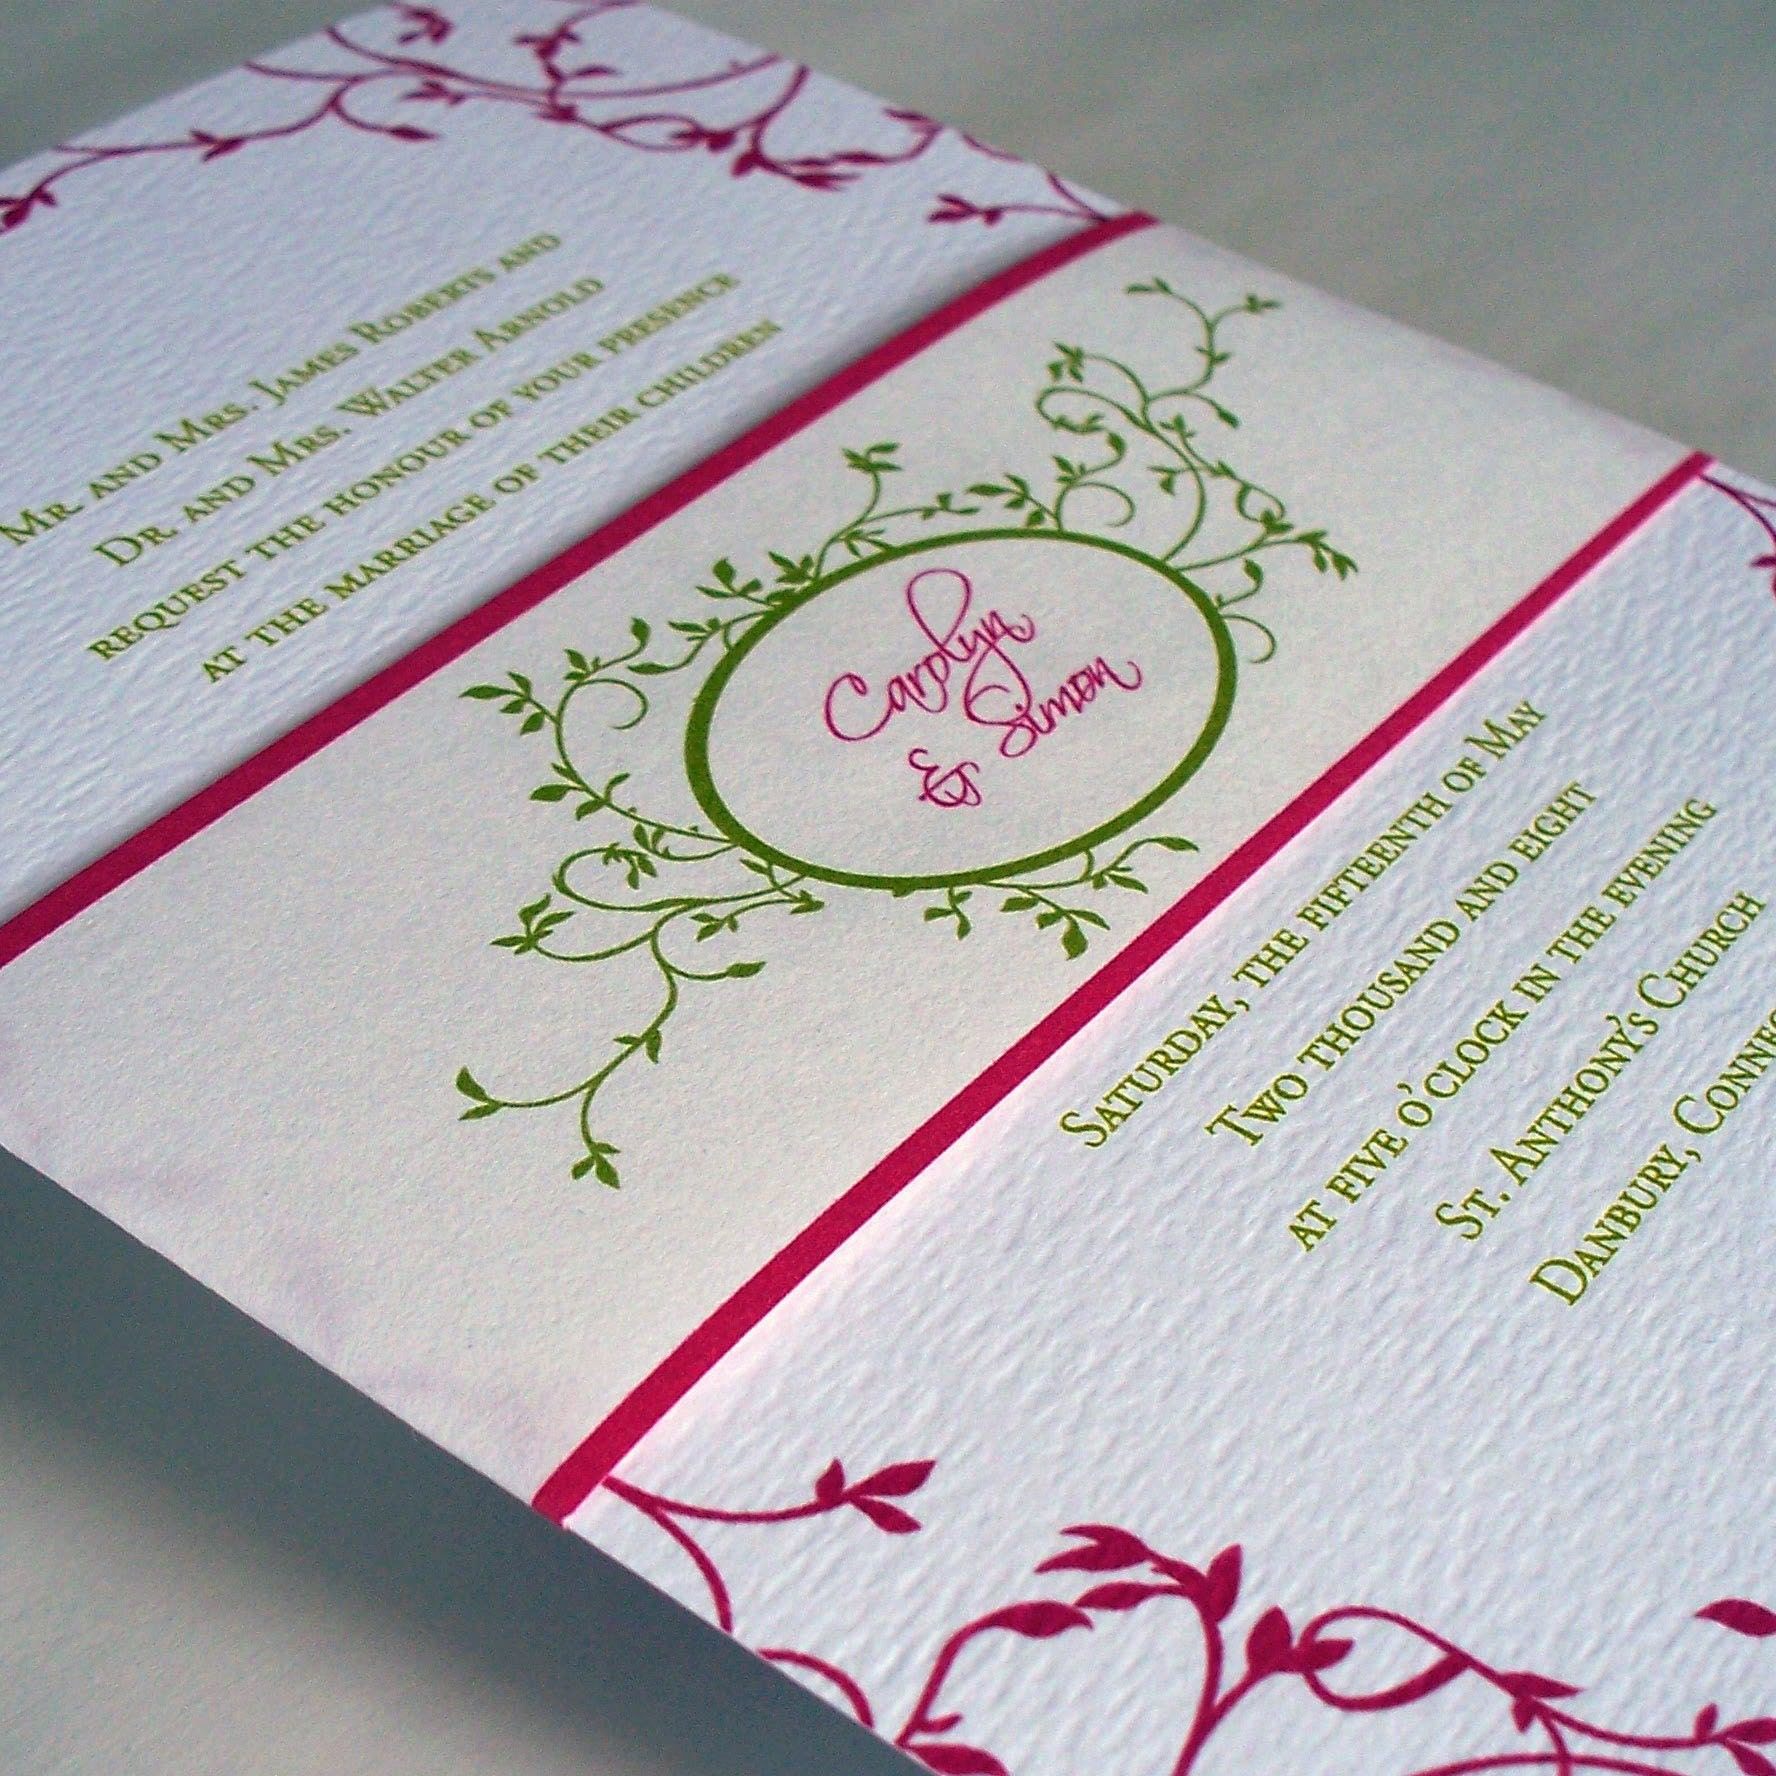 Outdoor Wedding Invitations: Secret Garden Wedding Invitation